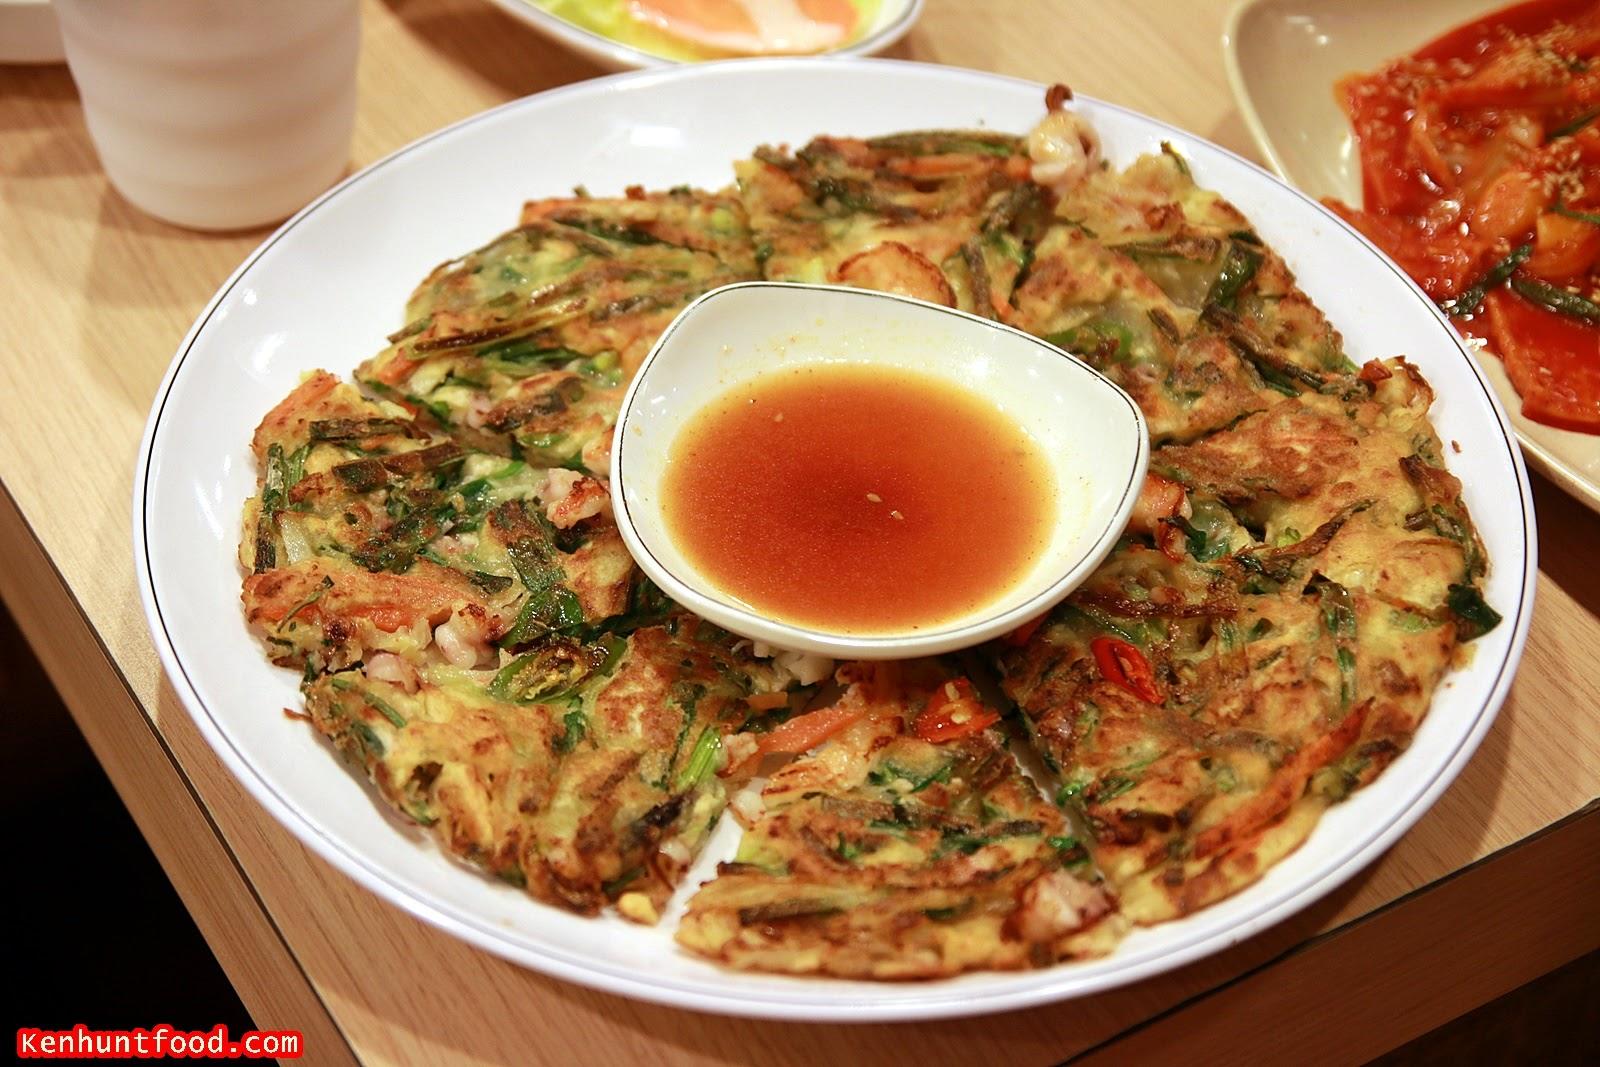 Ken Hunts Food: Miga Korean BBQ Restaurant @ Bay Avenue, Bayan Lepas